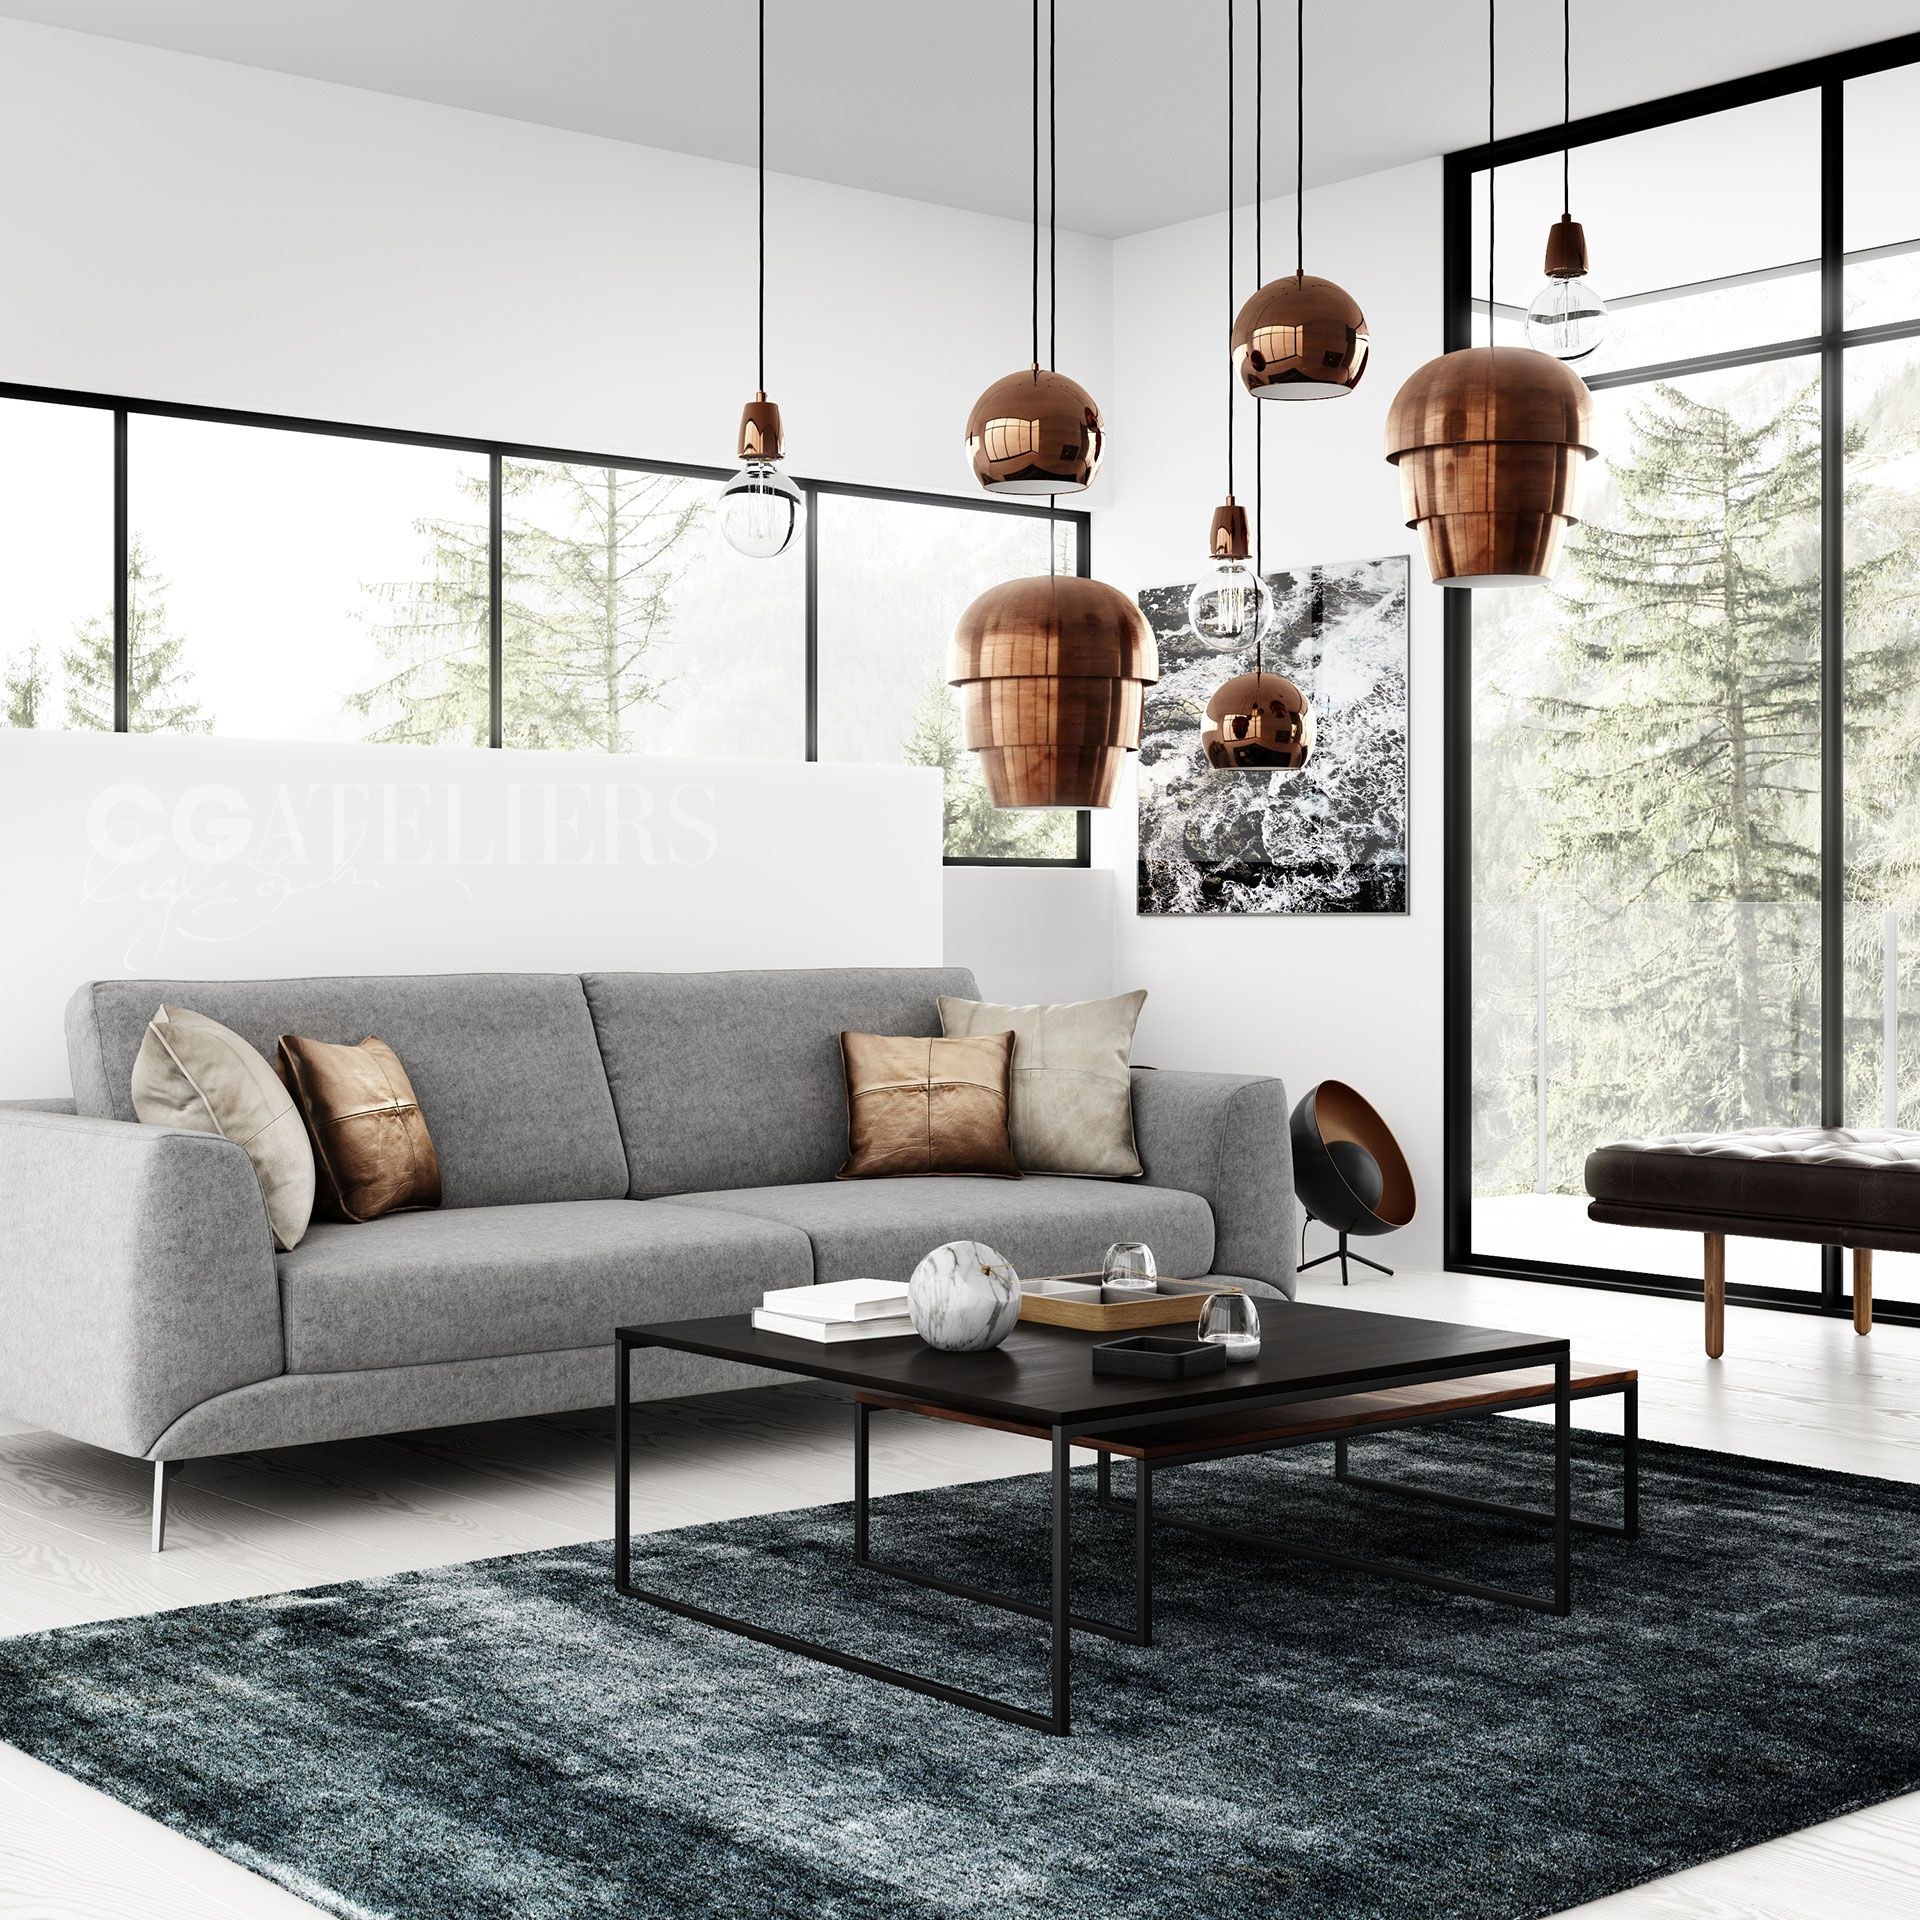 Bardzo Fajna Sofa Bo Concept Fargo Living Room Decor Gray Living Room Decor Grey Couch Trendy Living Rooms